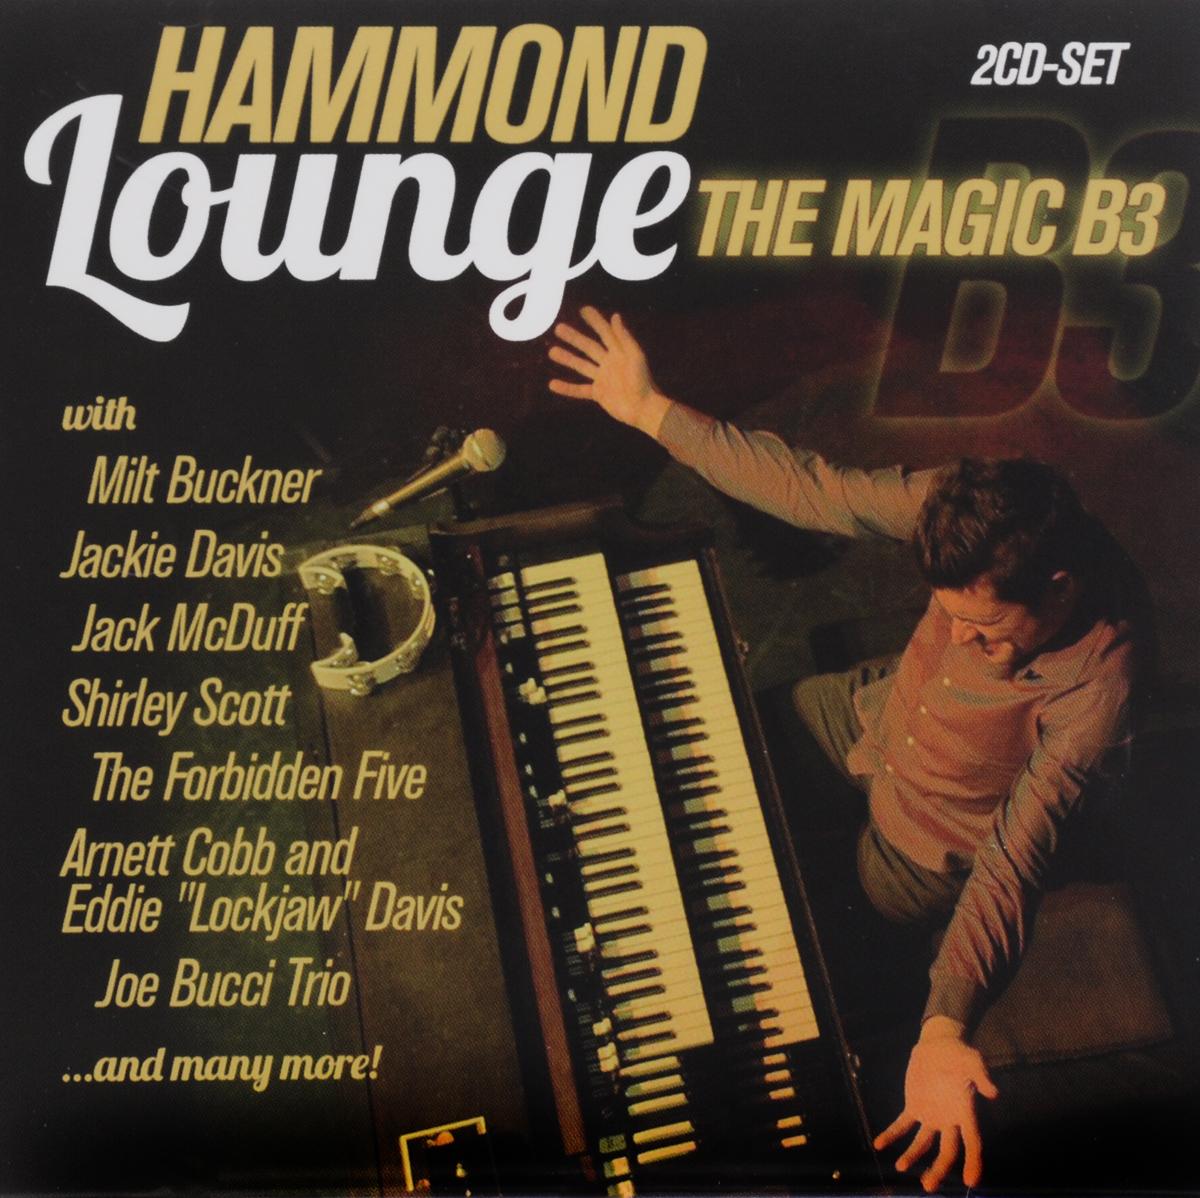 Hammond Lounge. The Magic B3 (2 CD) 2012 2 Audio CD